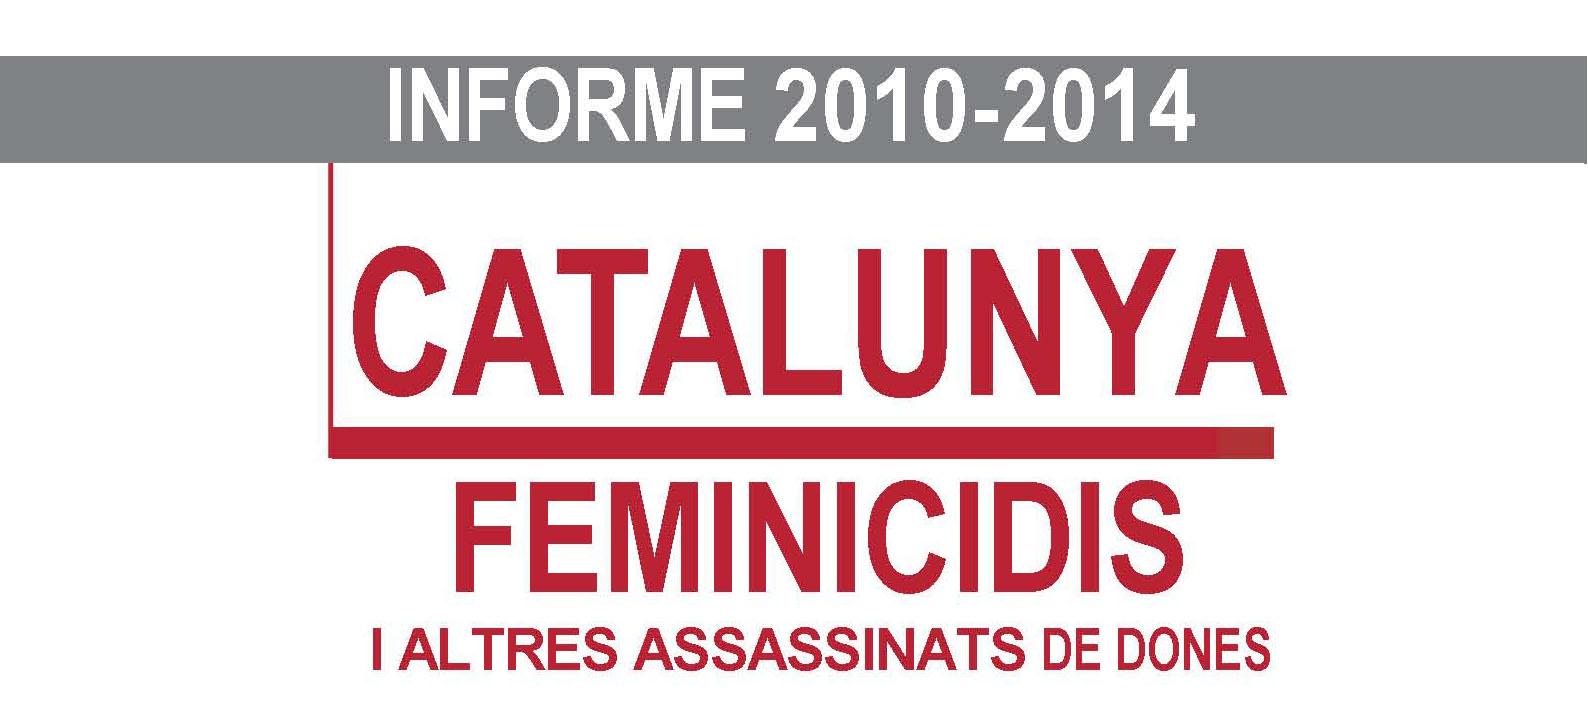 Informe Feminicidis